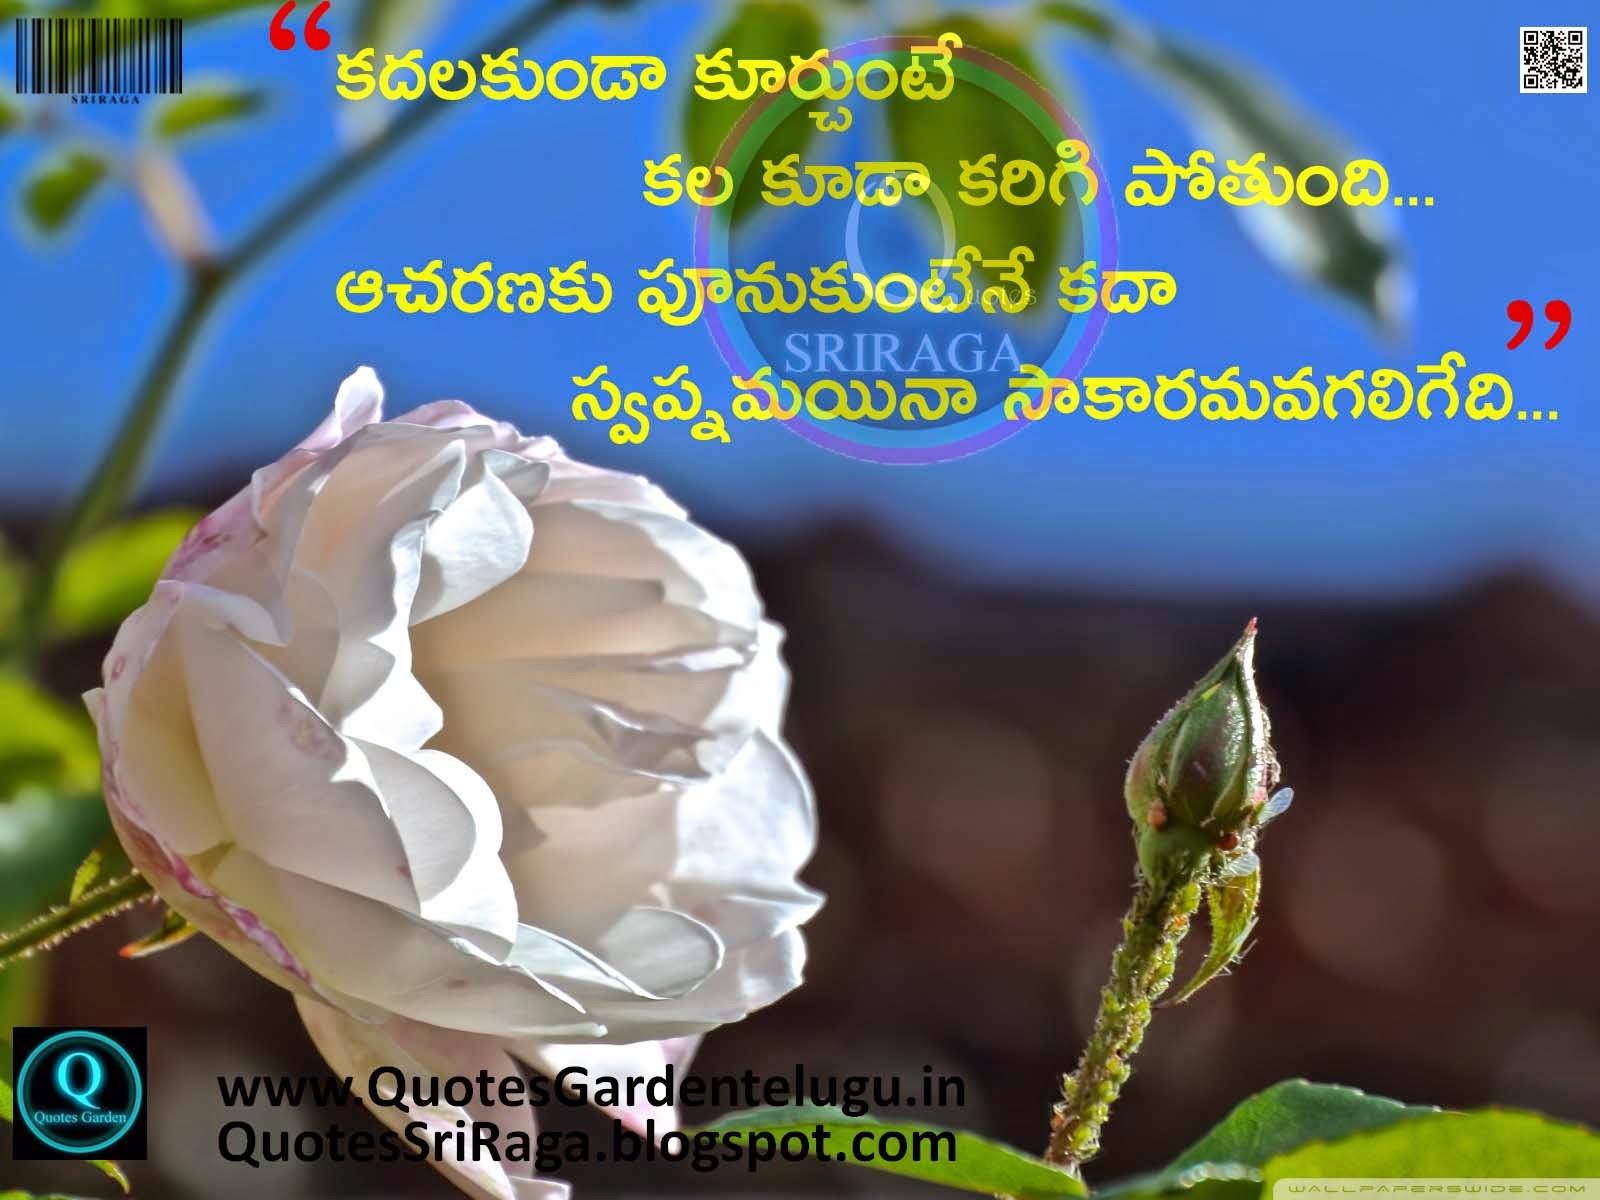 best educational quotes images telugu quotes garden